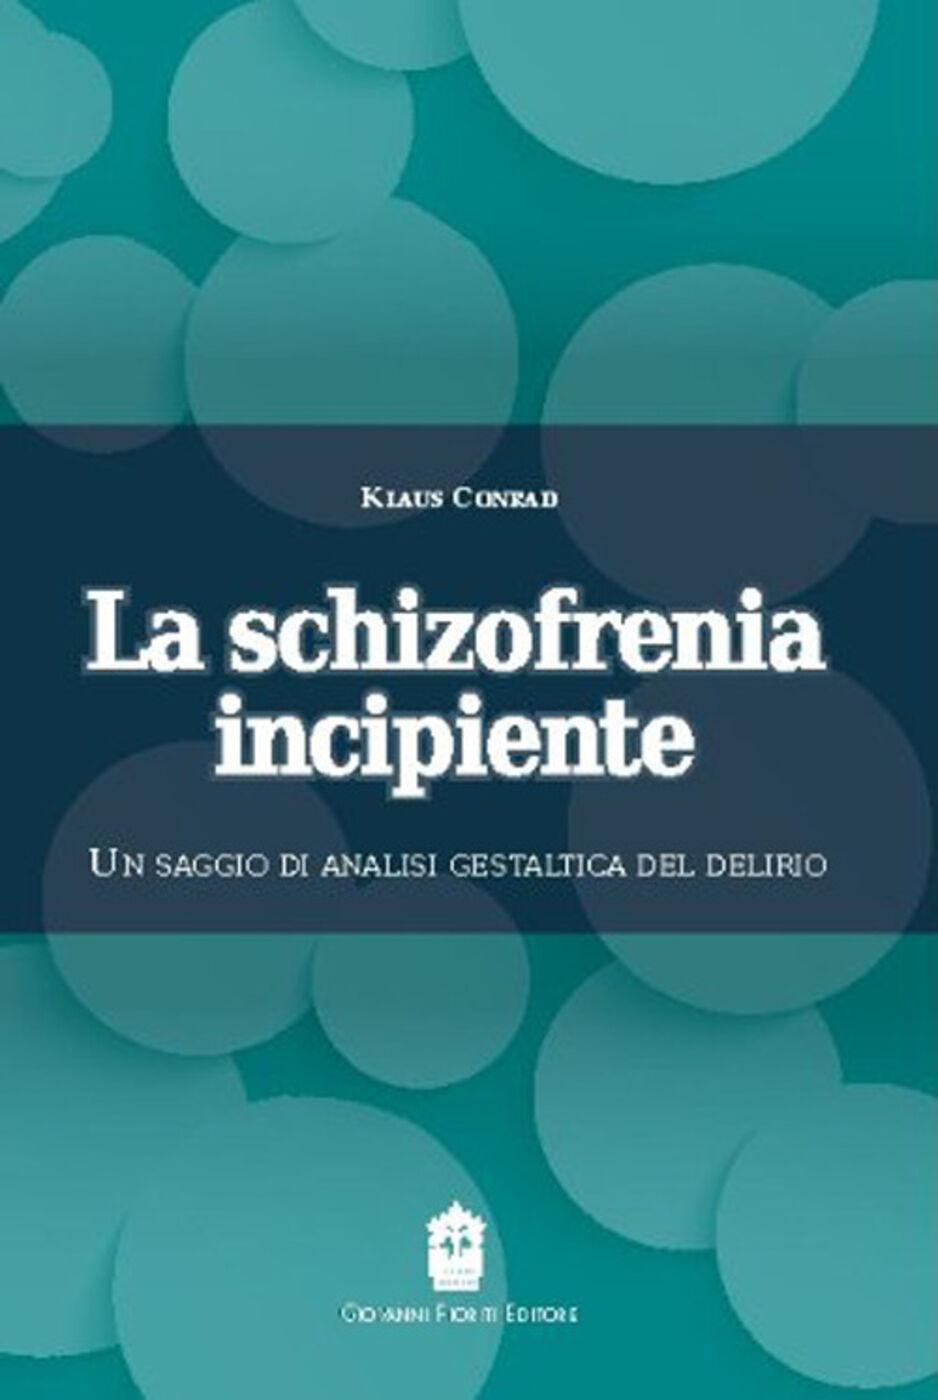 La schizofrenia incipiente. Un saggio di analisi gestaltica del delirio